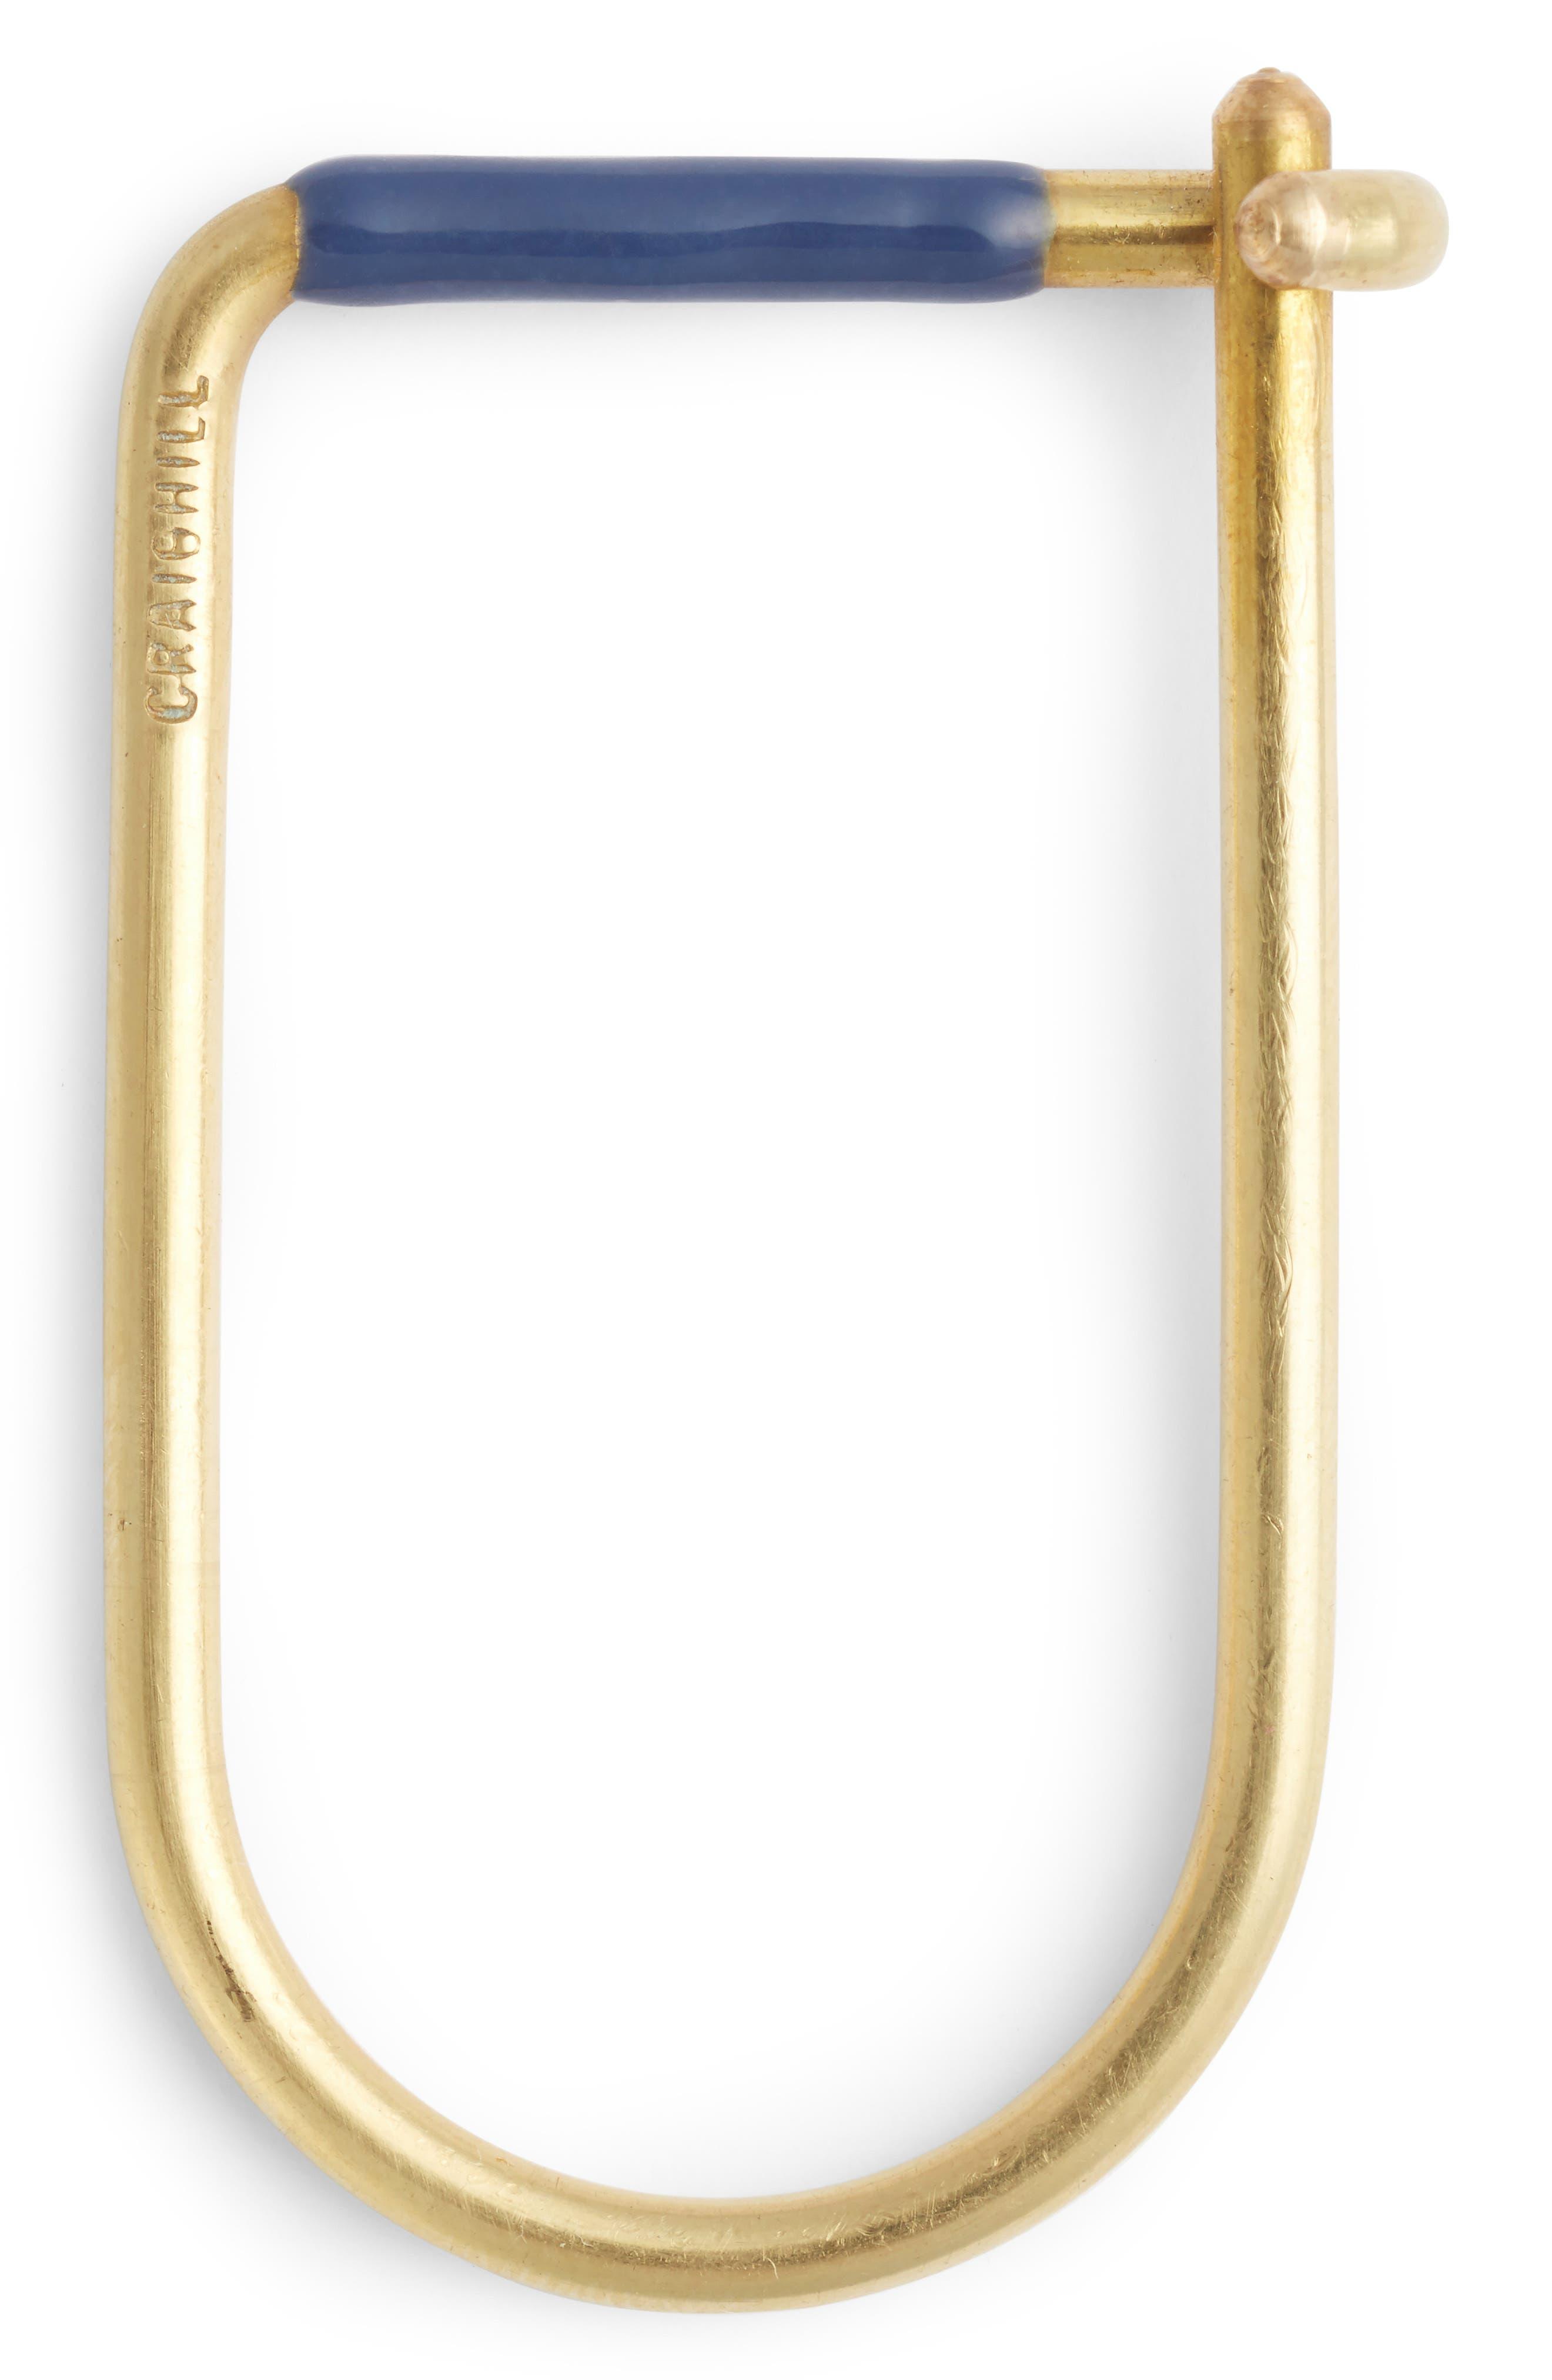 Wilson Enameled Brass Key Ring,                             Main thumbnail 1, color,                             Blue